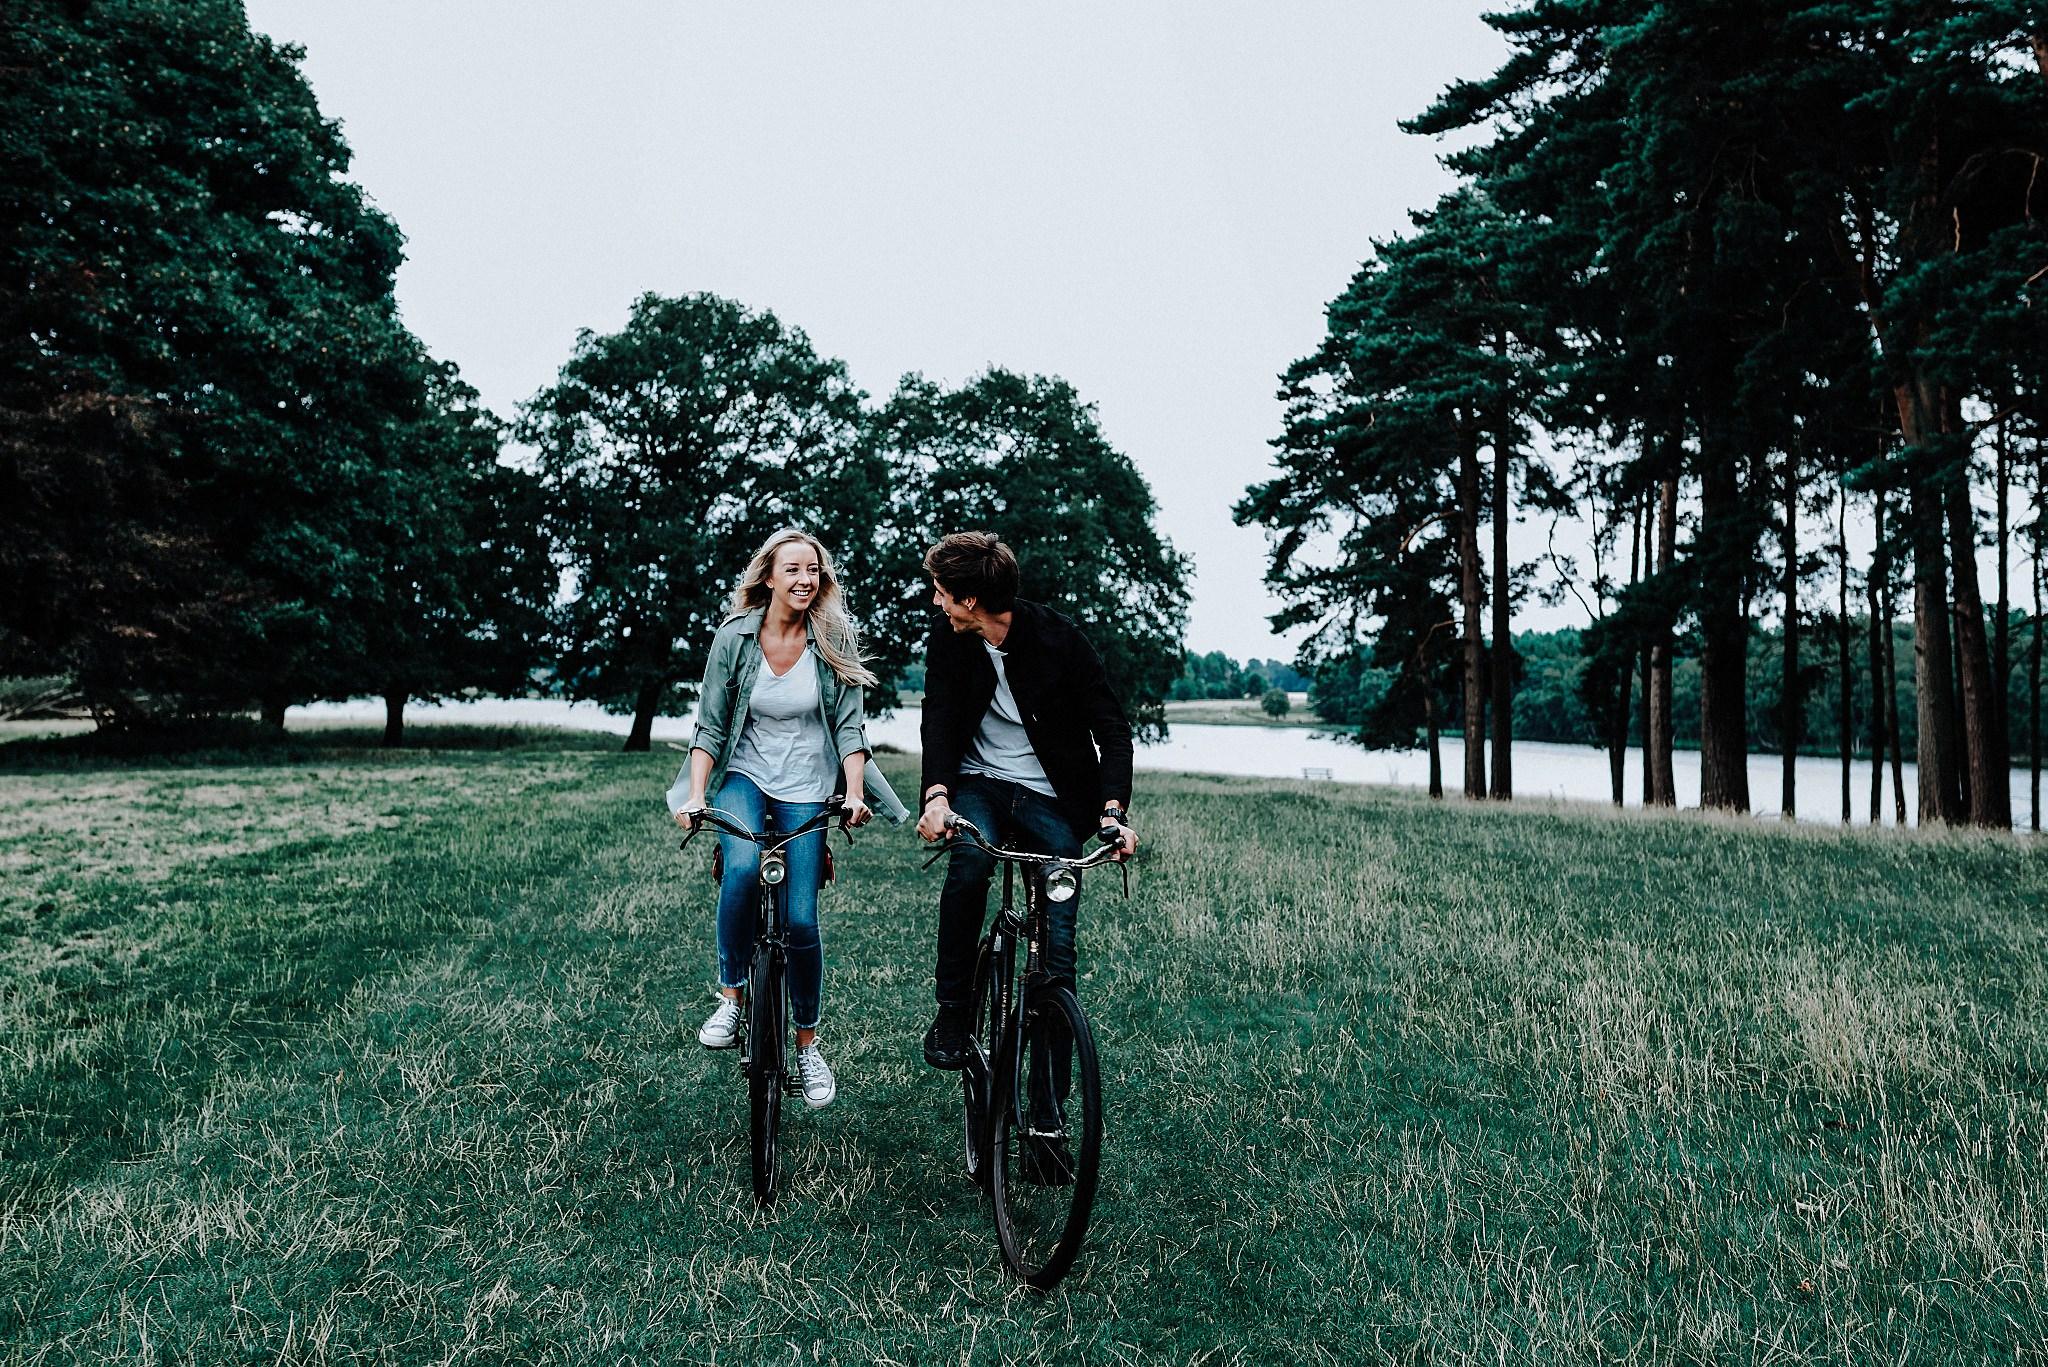 Lauren & Christopher riding vintage bikes in Tatton Park, Cheshire